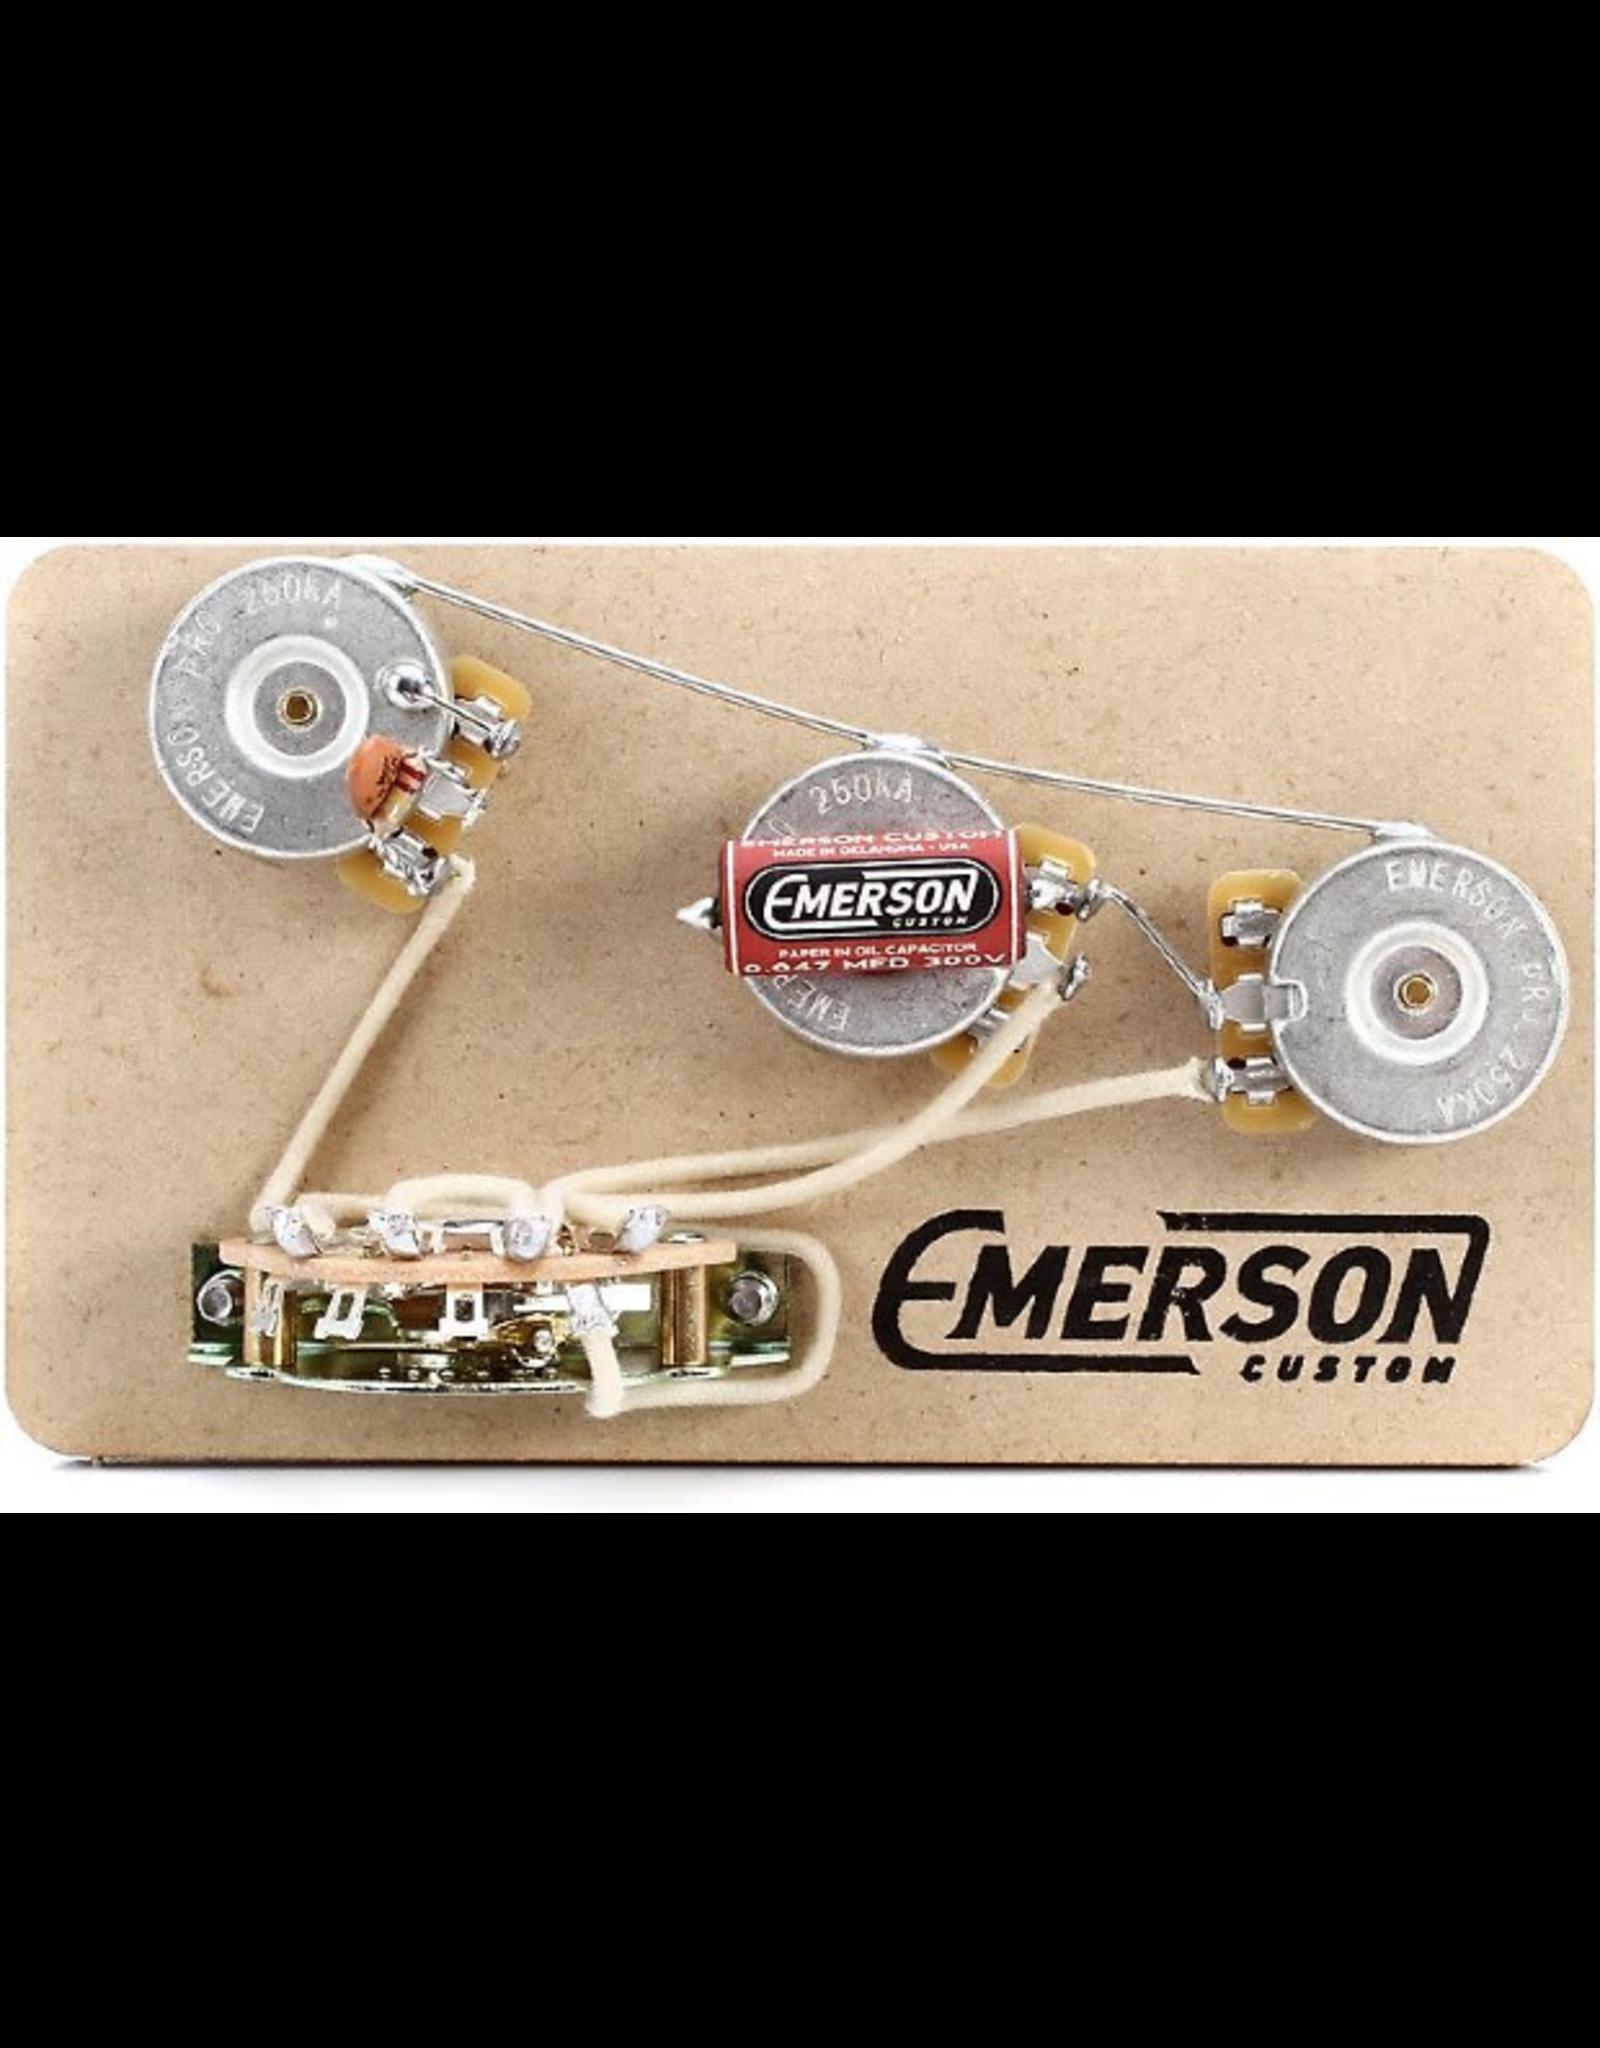 Emerson Emerson Custom 5-Way Strat Prewired Kit S5